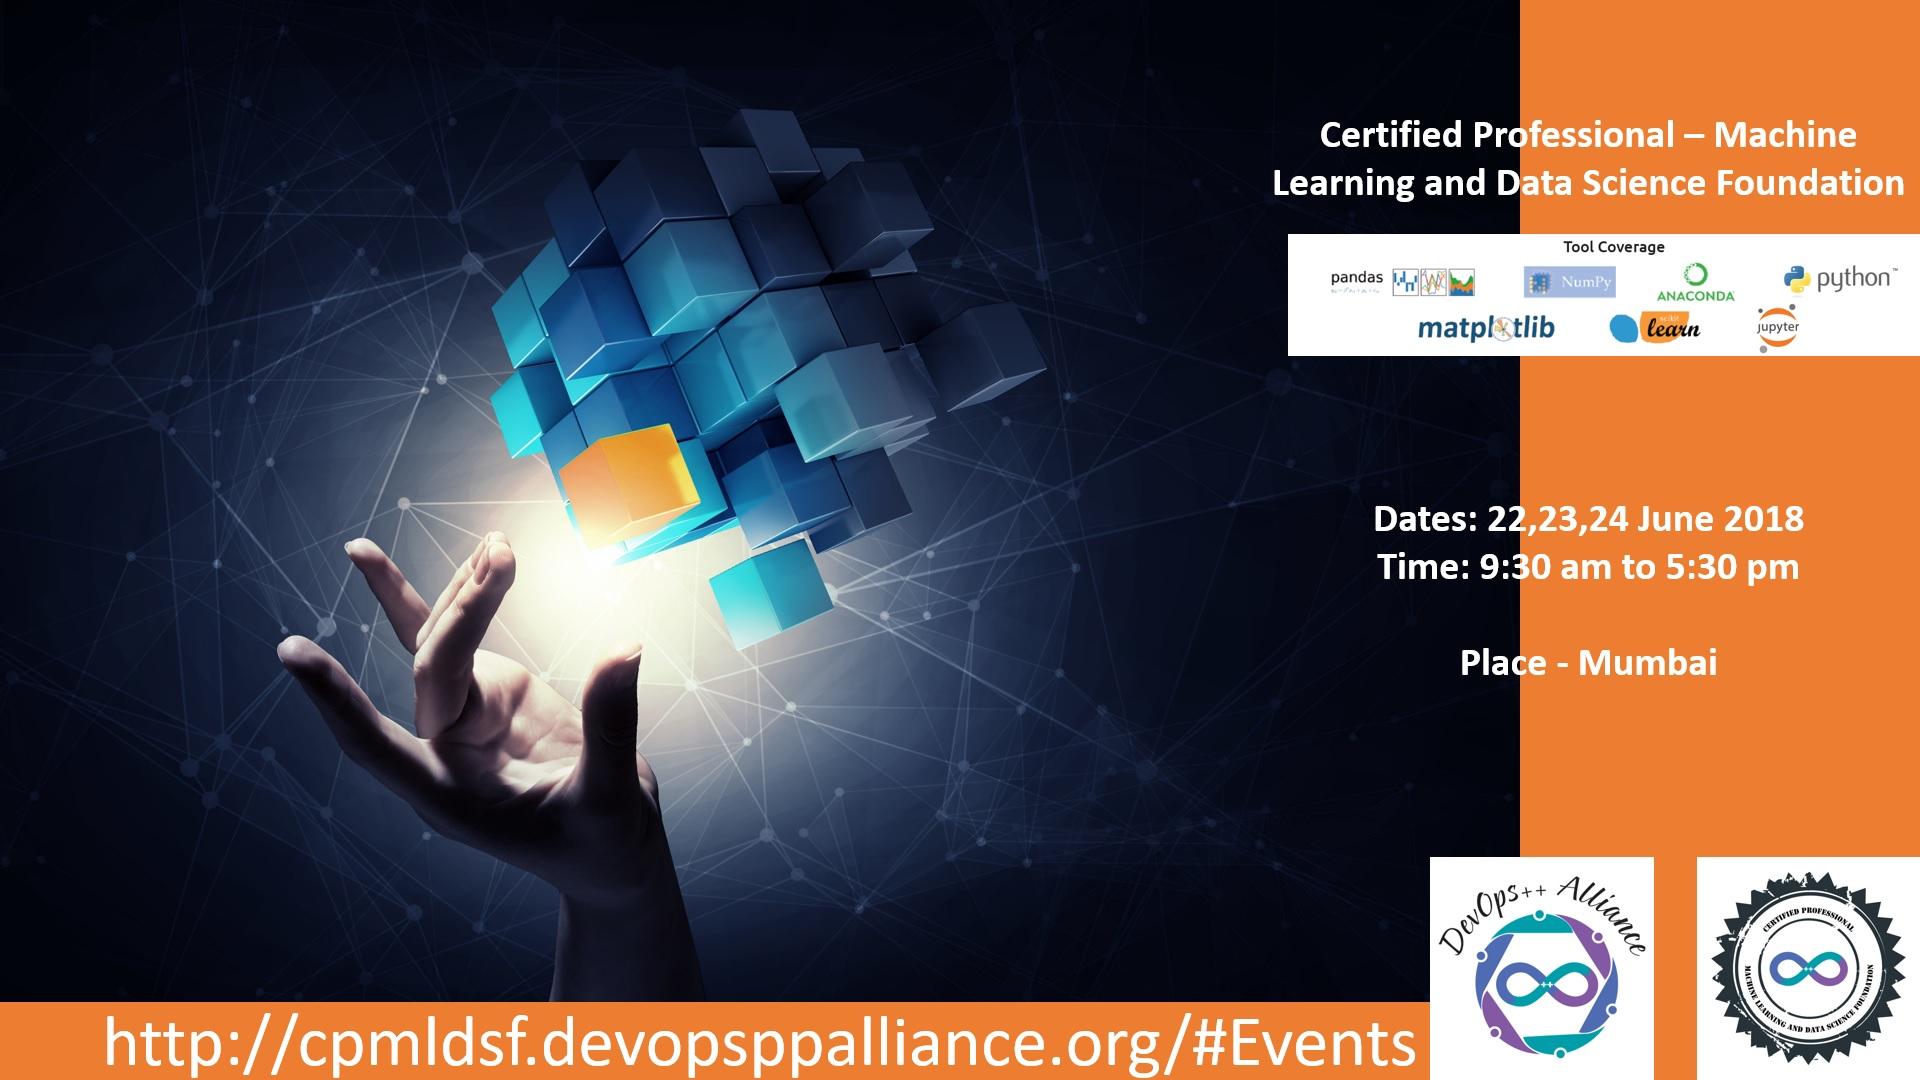 Certified Professional - Machine Learning and Data Science Program Tickets  by Agile Testing Alliance & DevOps++ Alliance, 22 Jun, 2018, NAvi mumbai